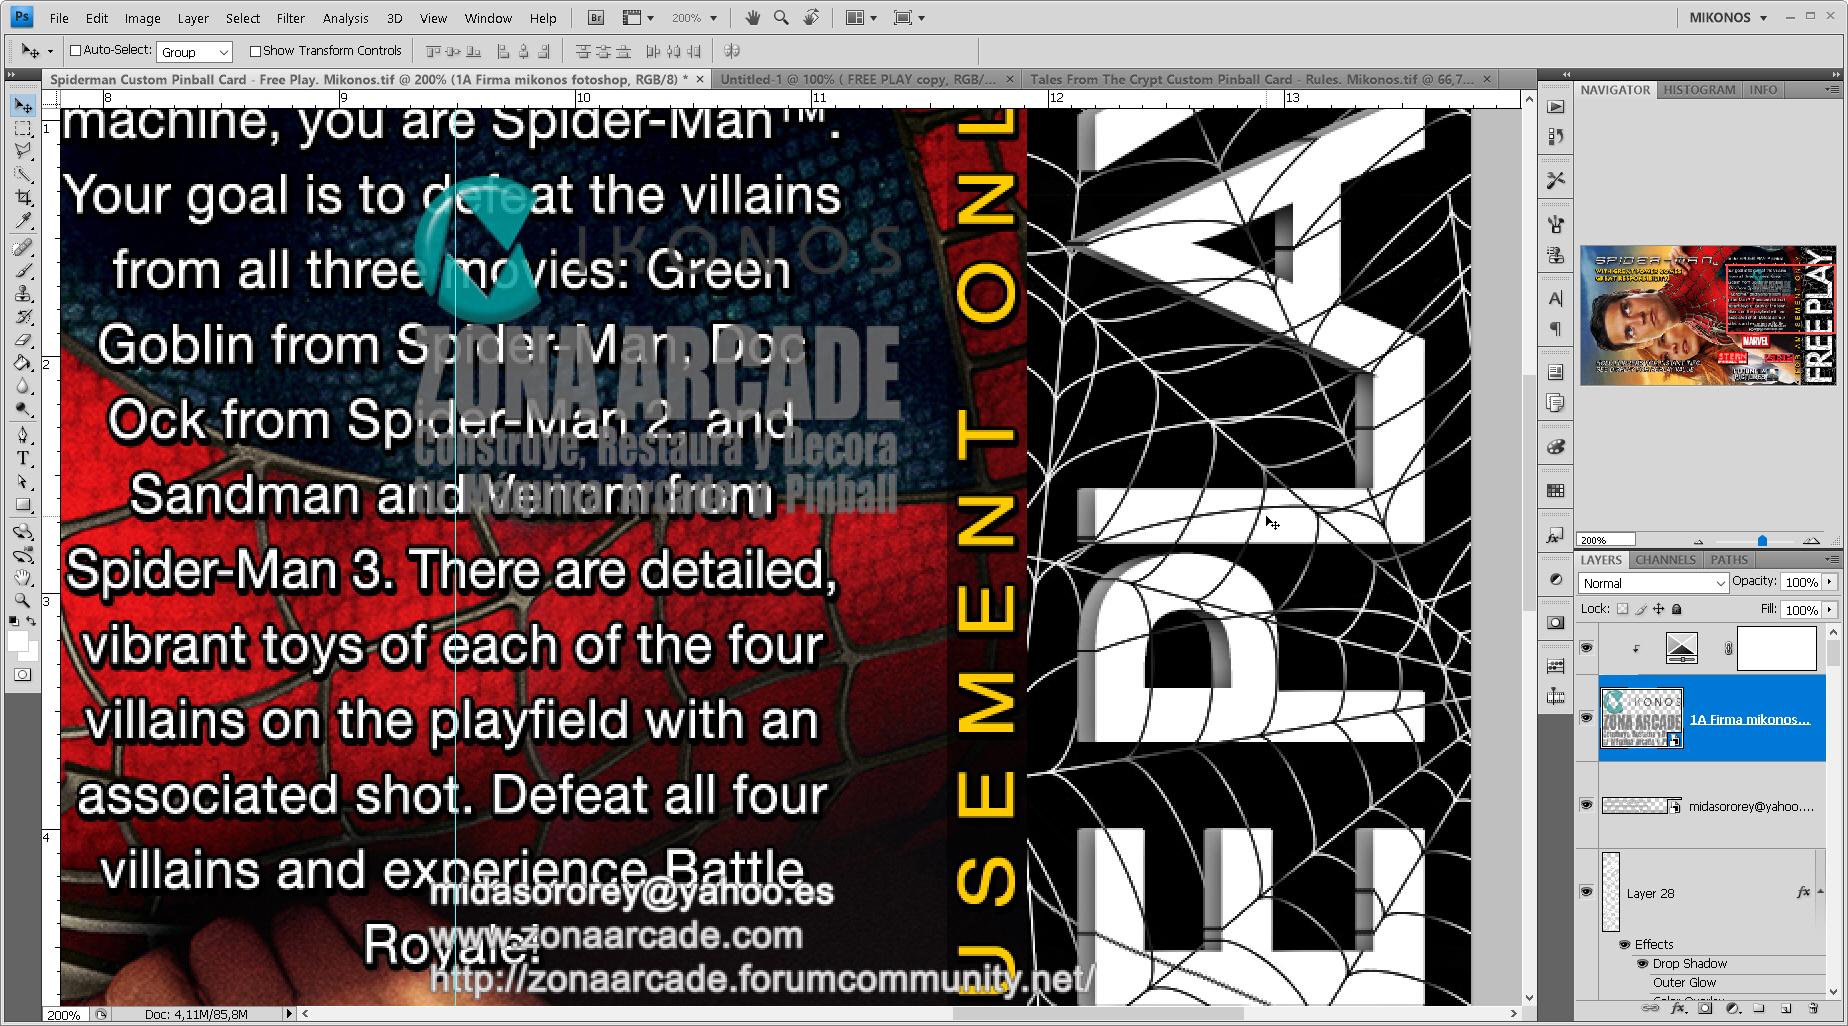 Spiderman%20Custom%20Pinball%20Card%20-%20Free%20Play.%20Mikonos3.jpg